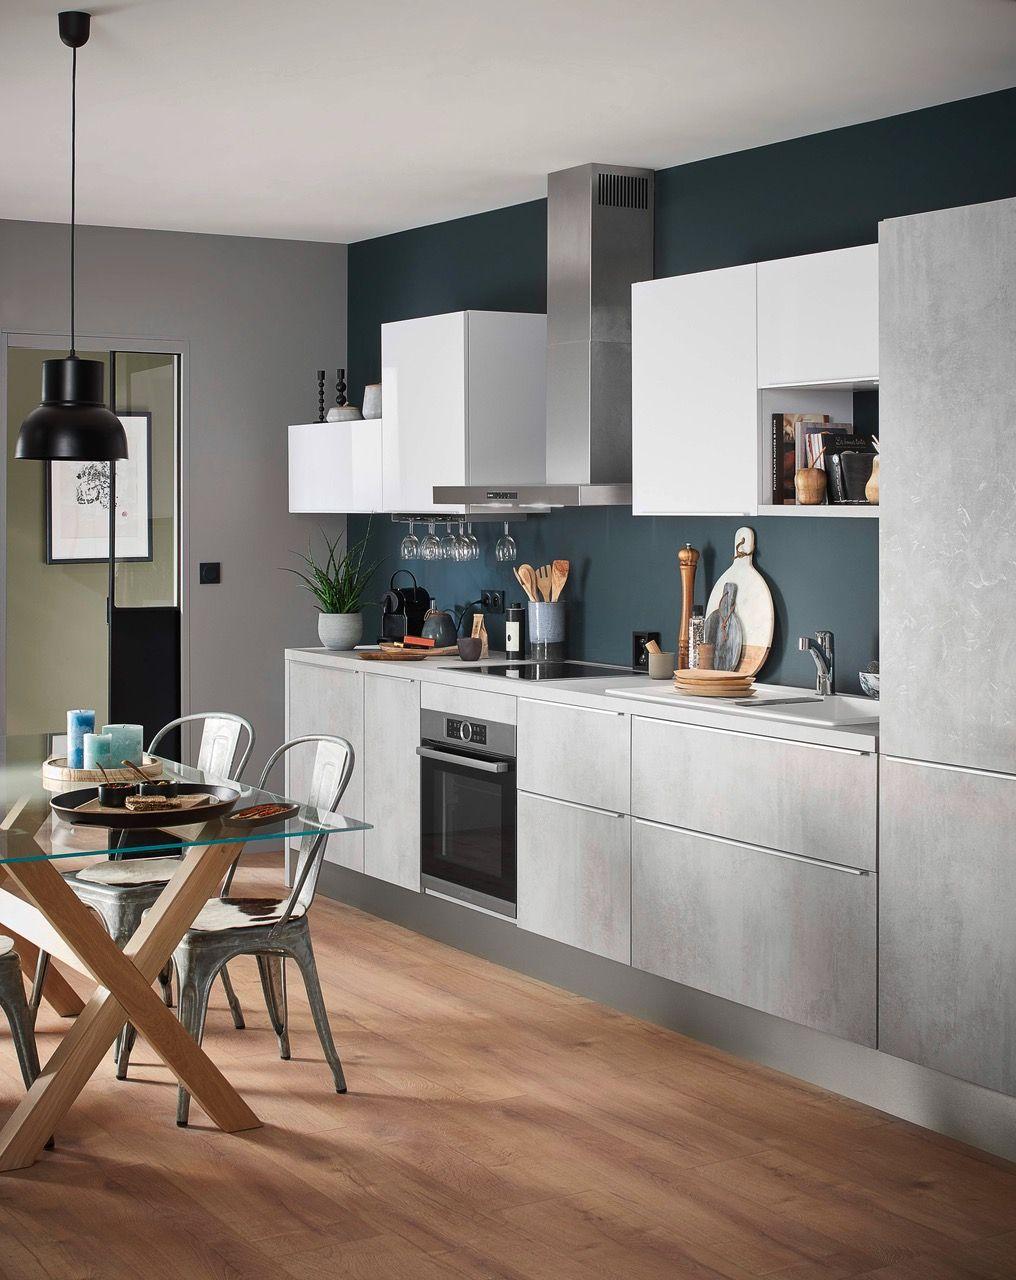 aménager sa cuisine : conseils et astuces | c o o k | pinterest